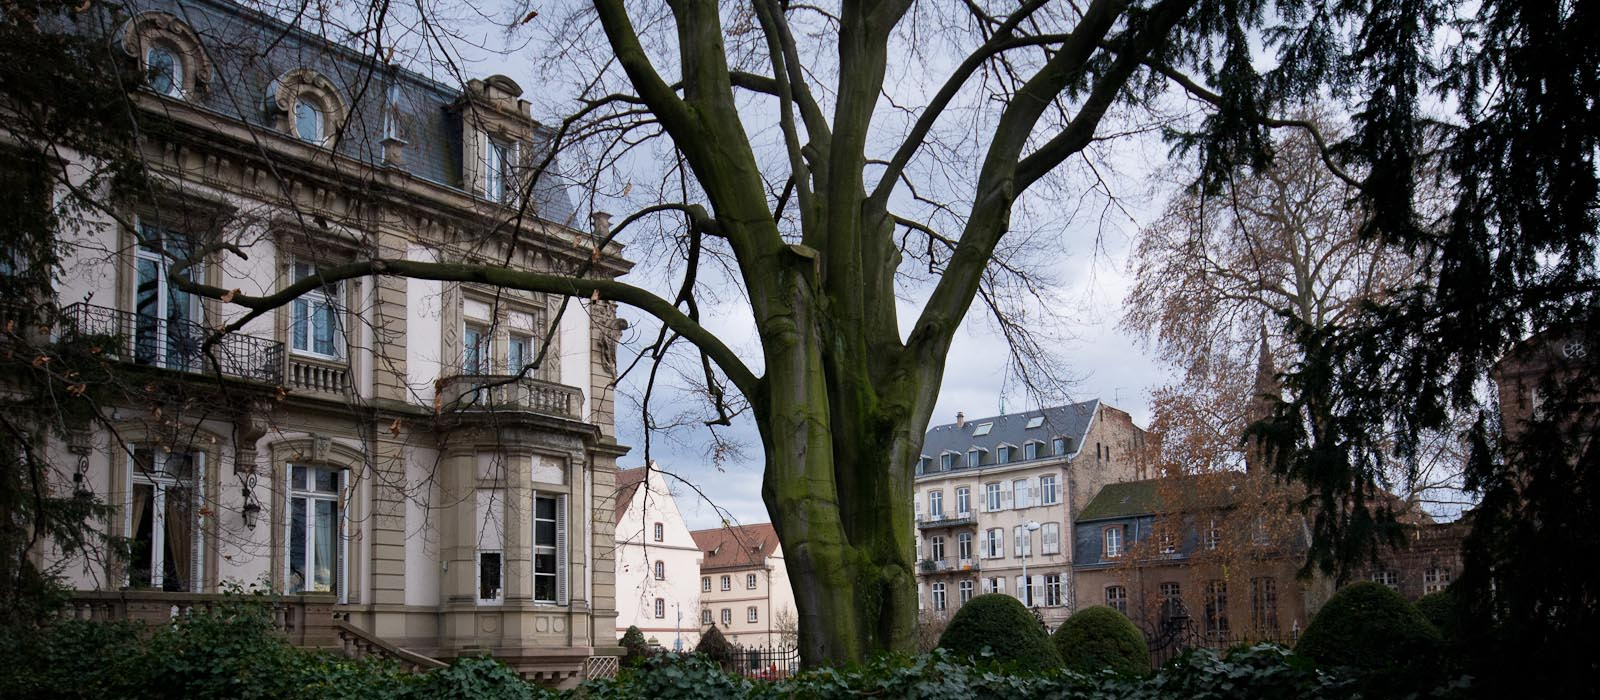 0119_Strasbourg_002